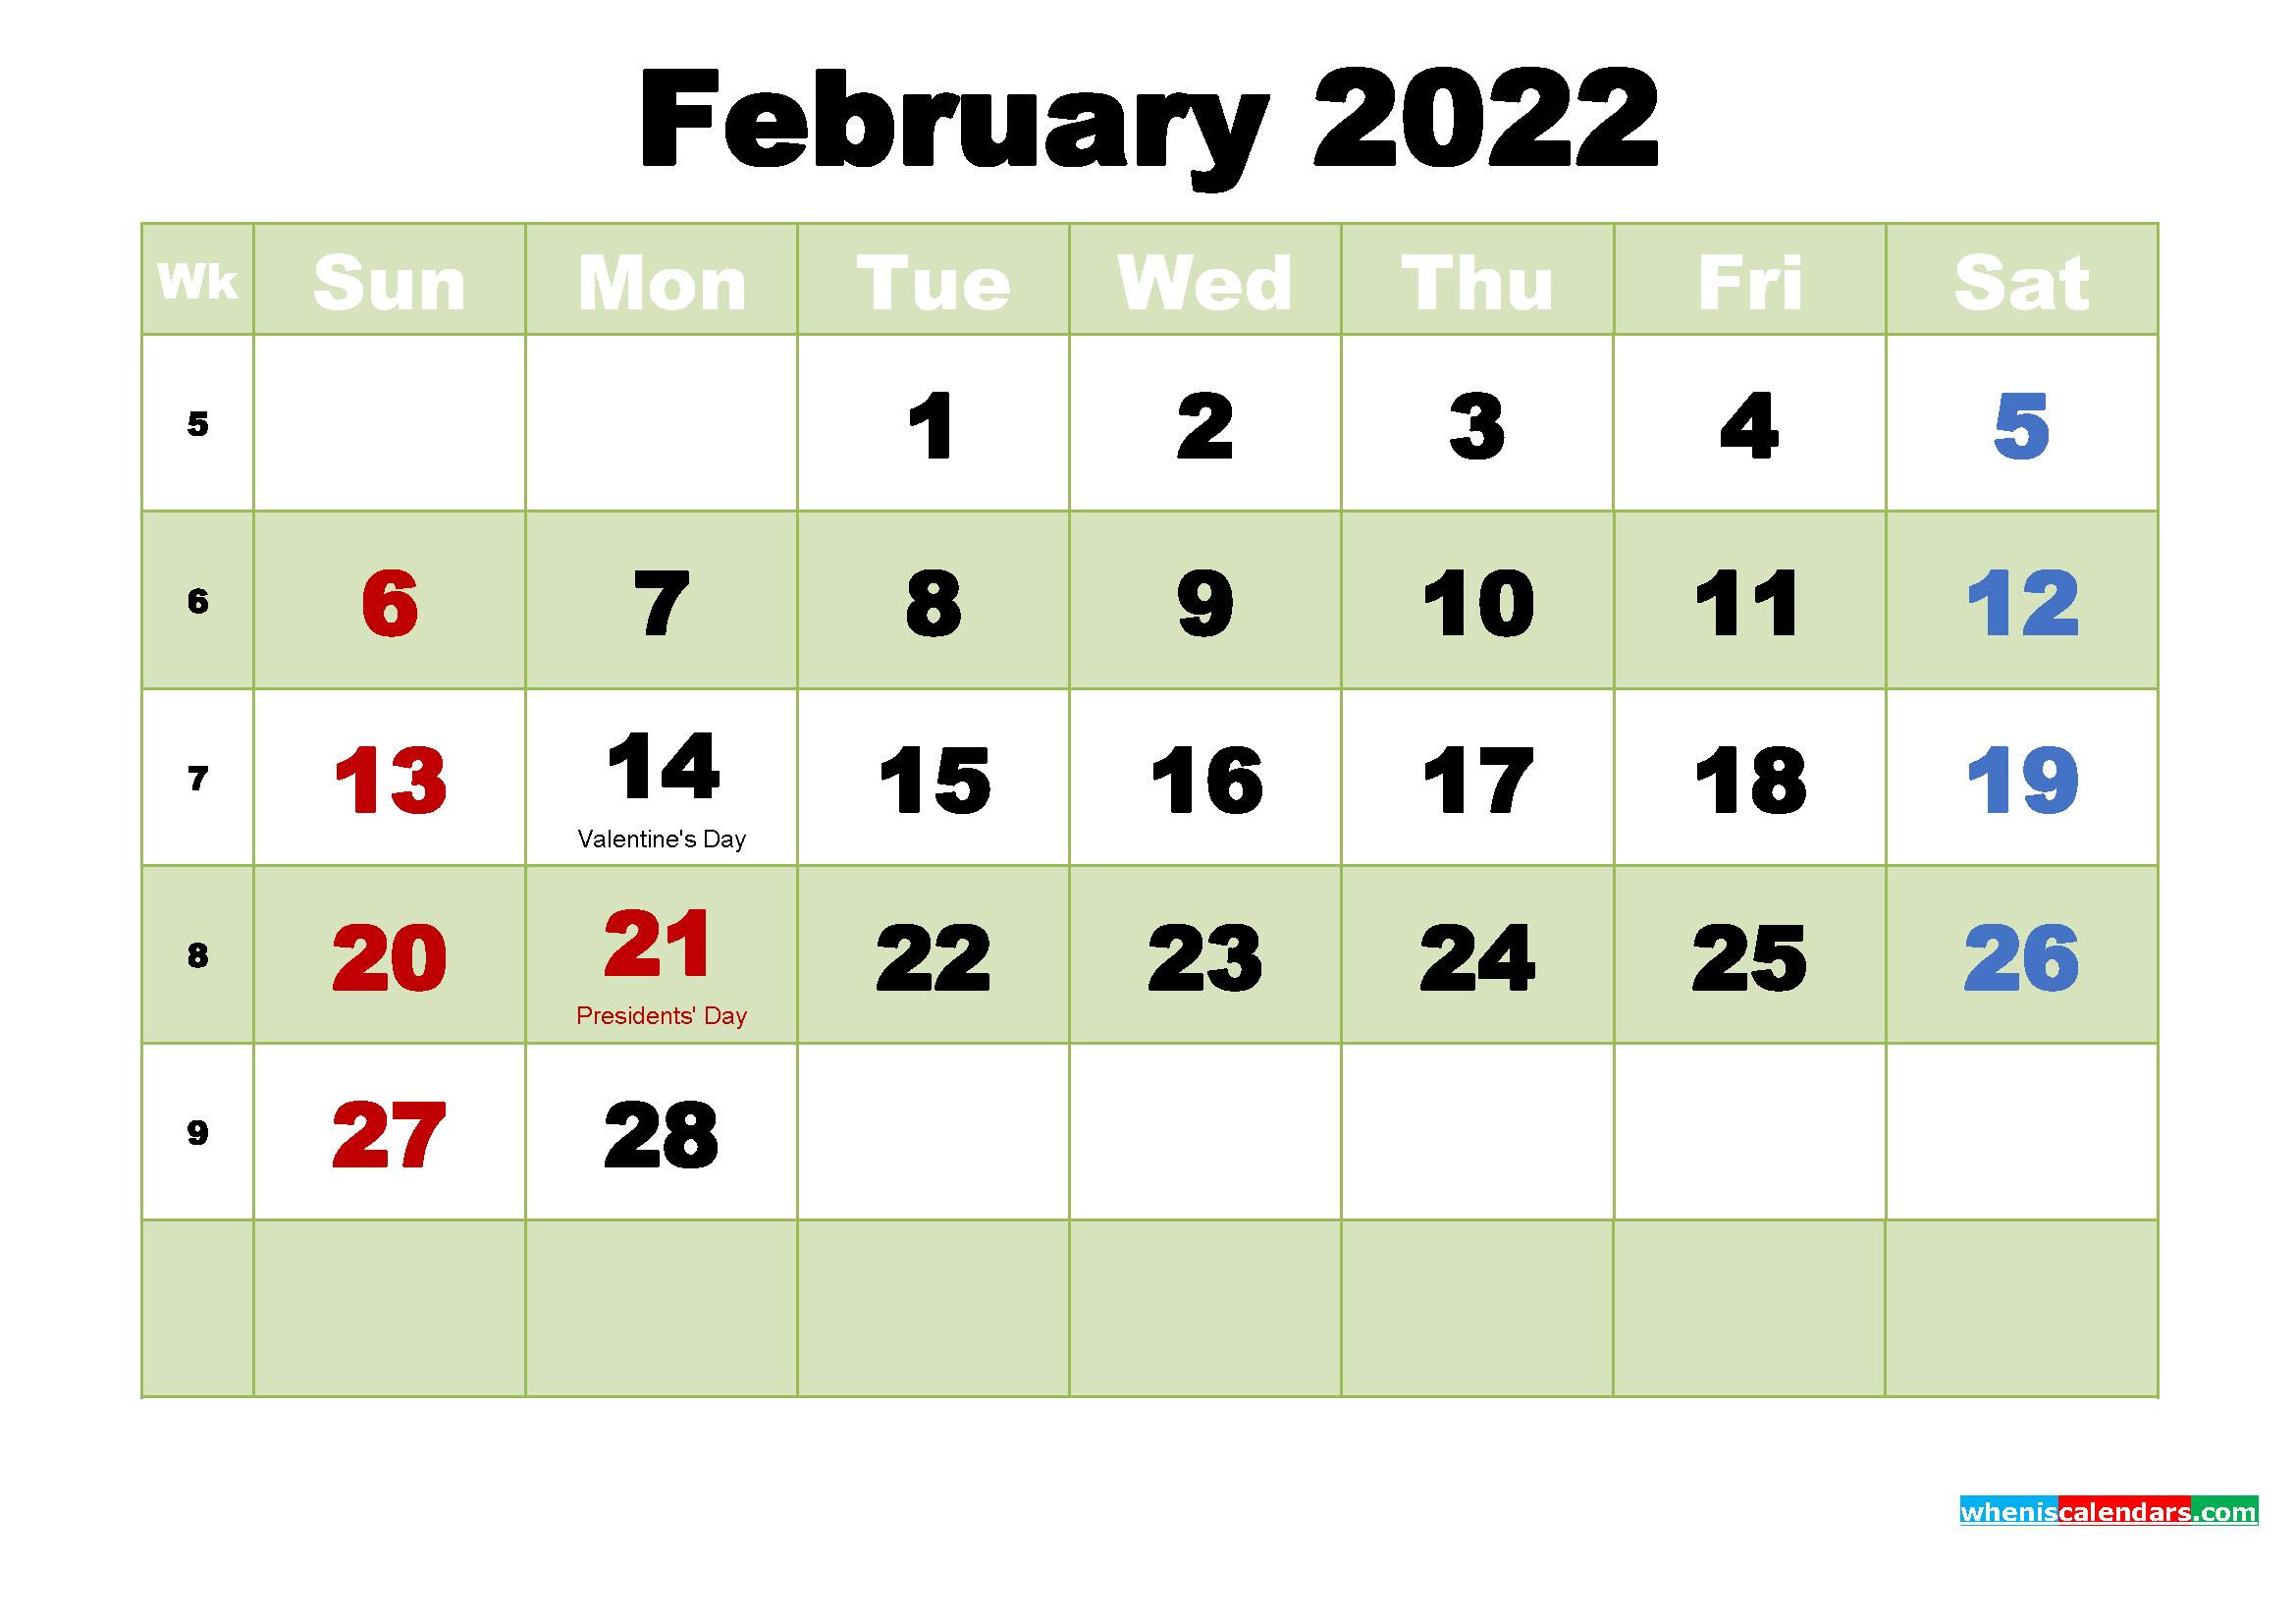 Free Printable February 2022 Calendar Wallpaper